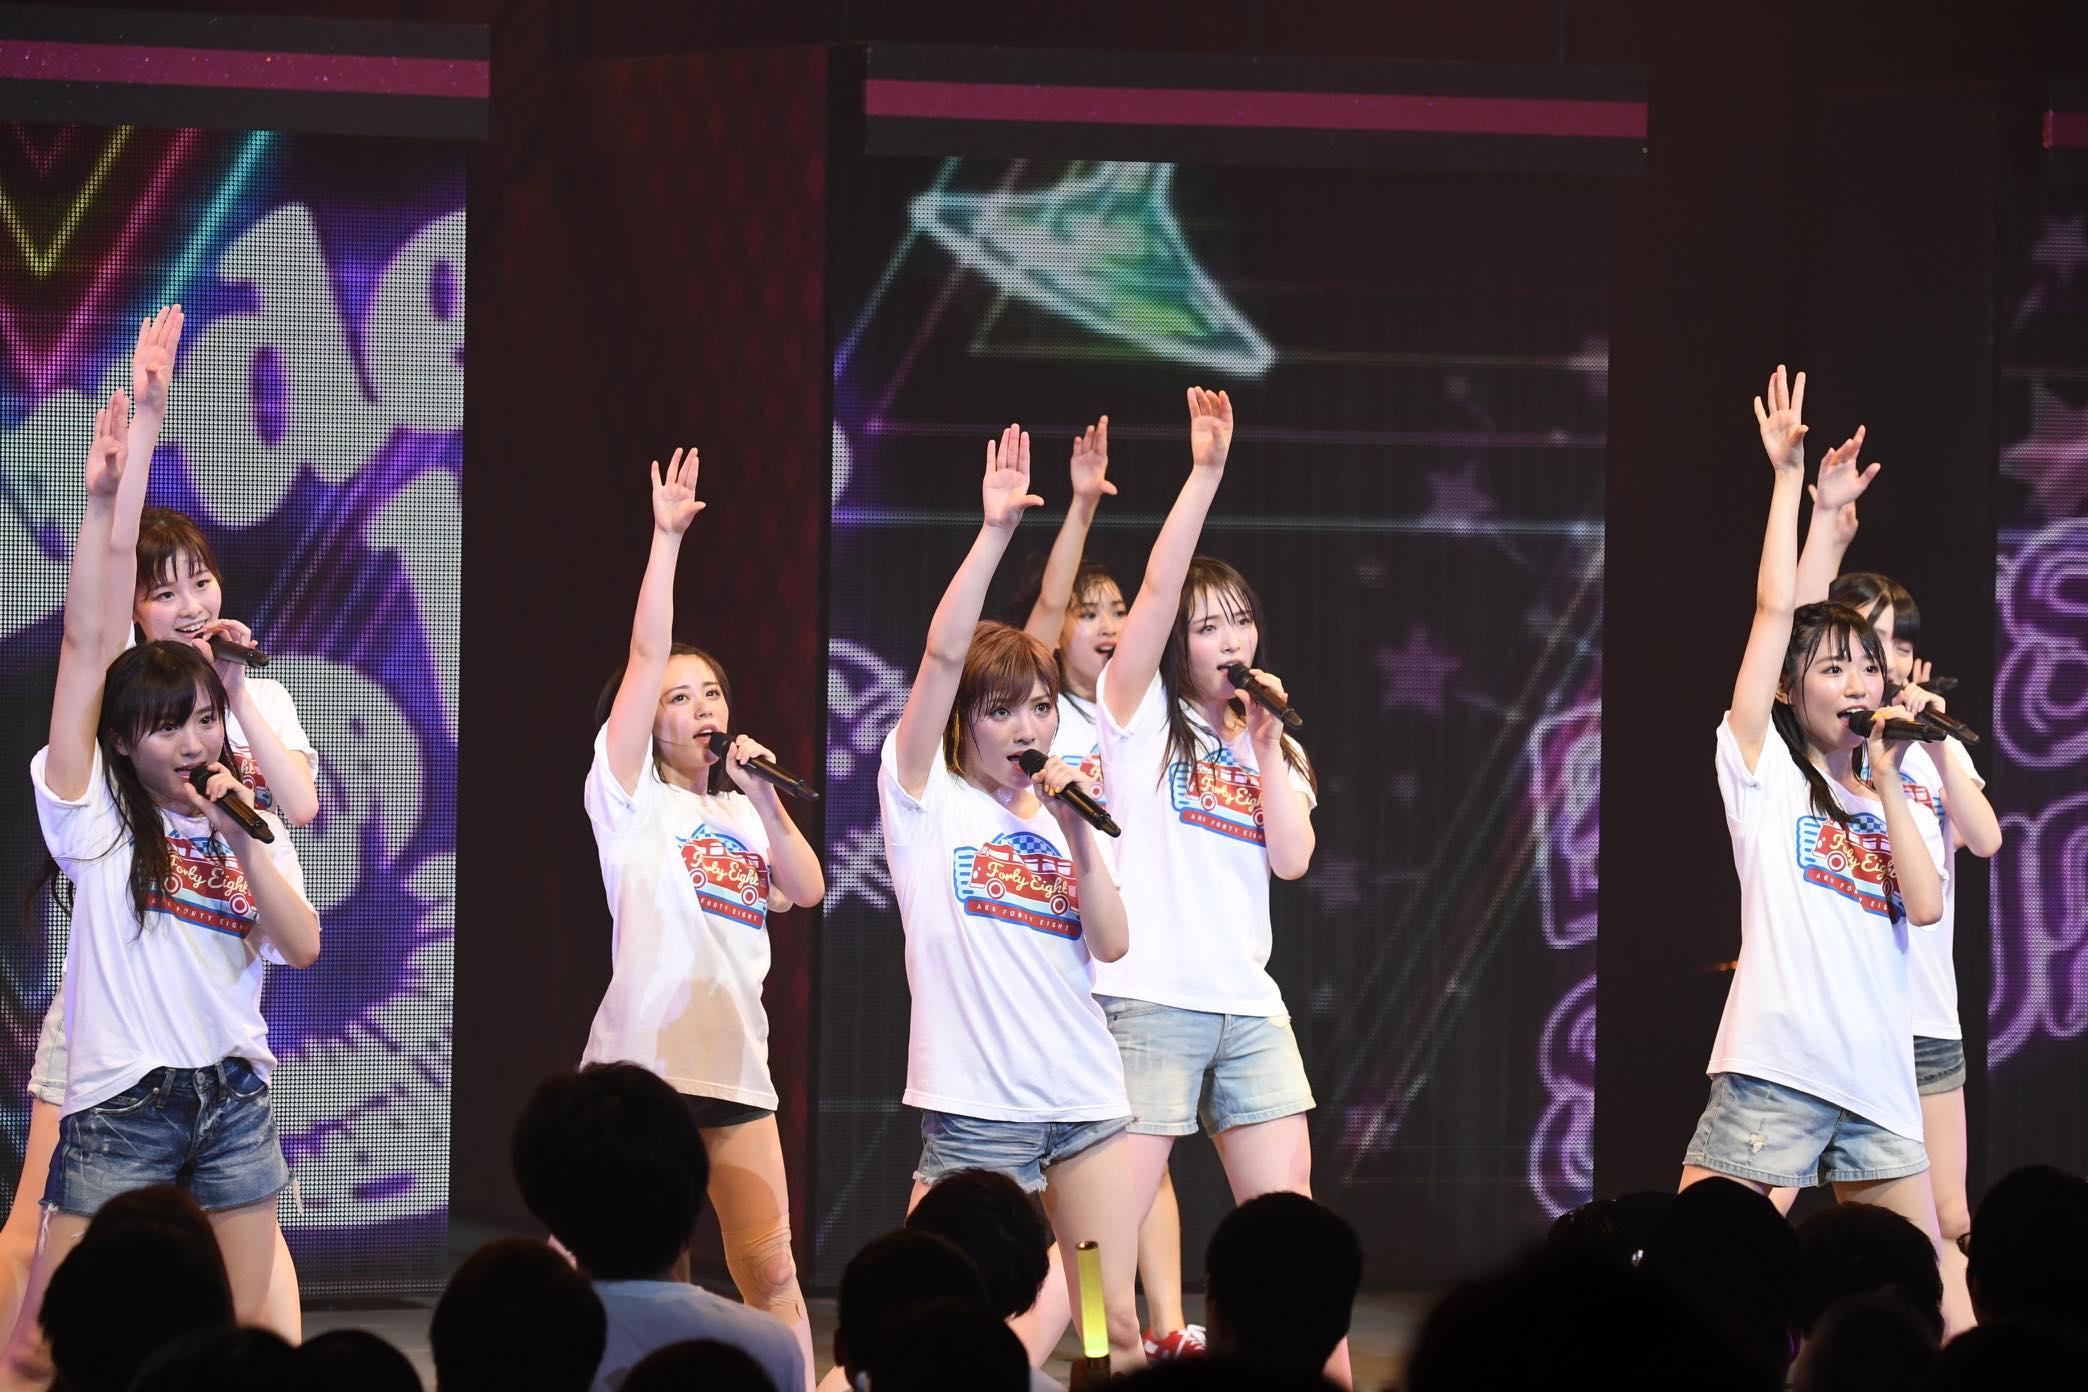 AKB48全国ツアー「神奈川公演」開催、チームBとチーム4のパワーが炸裂!【写真17枚】の画像015